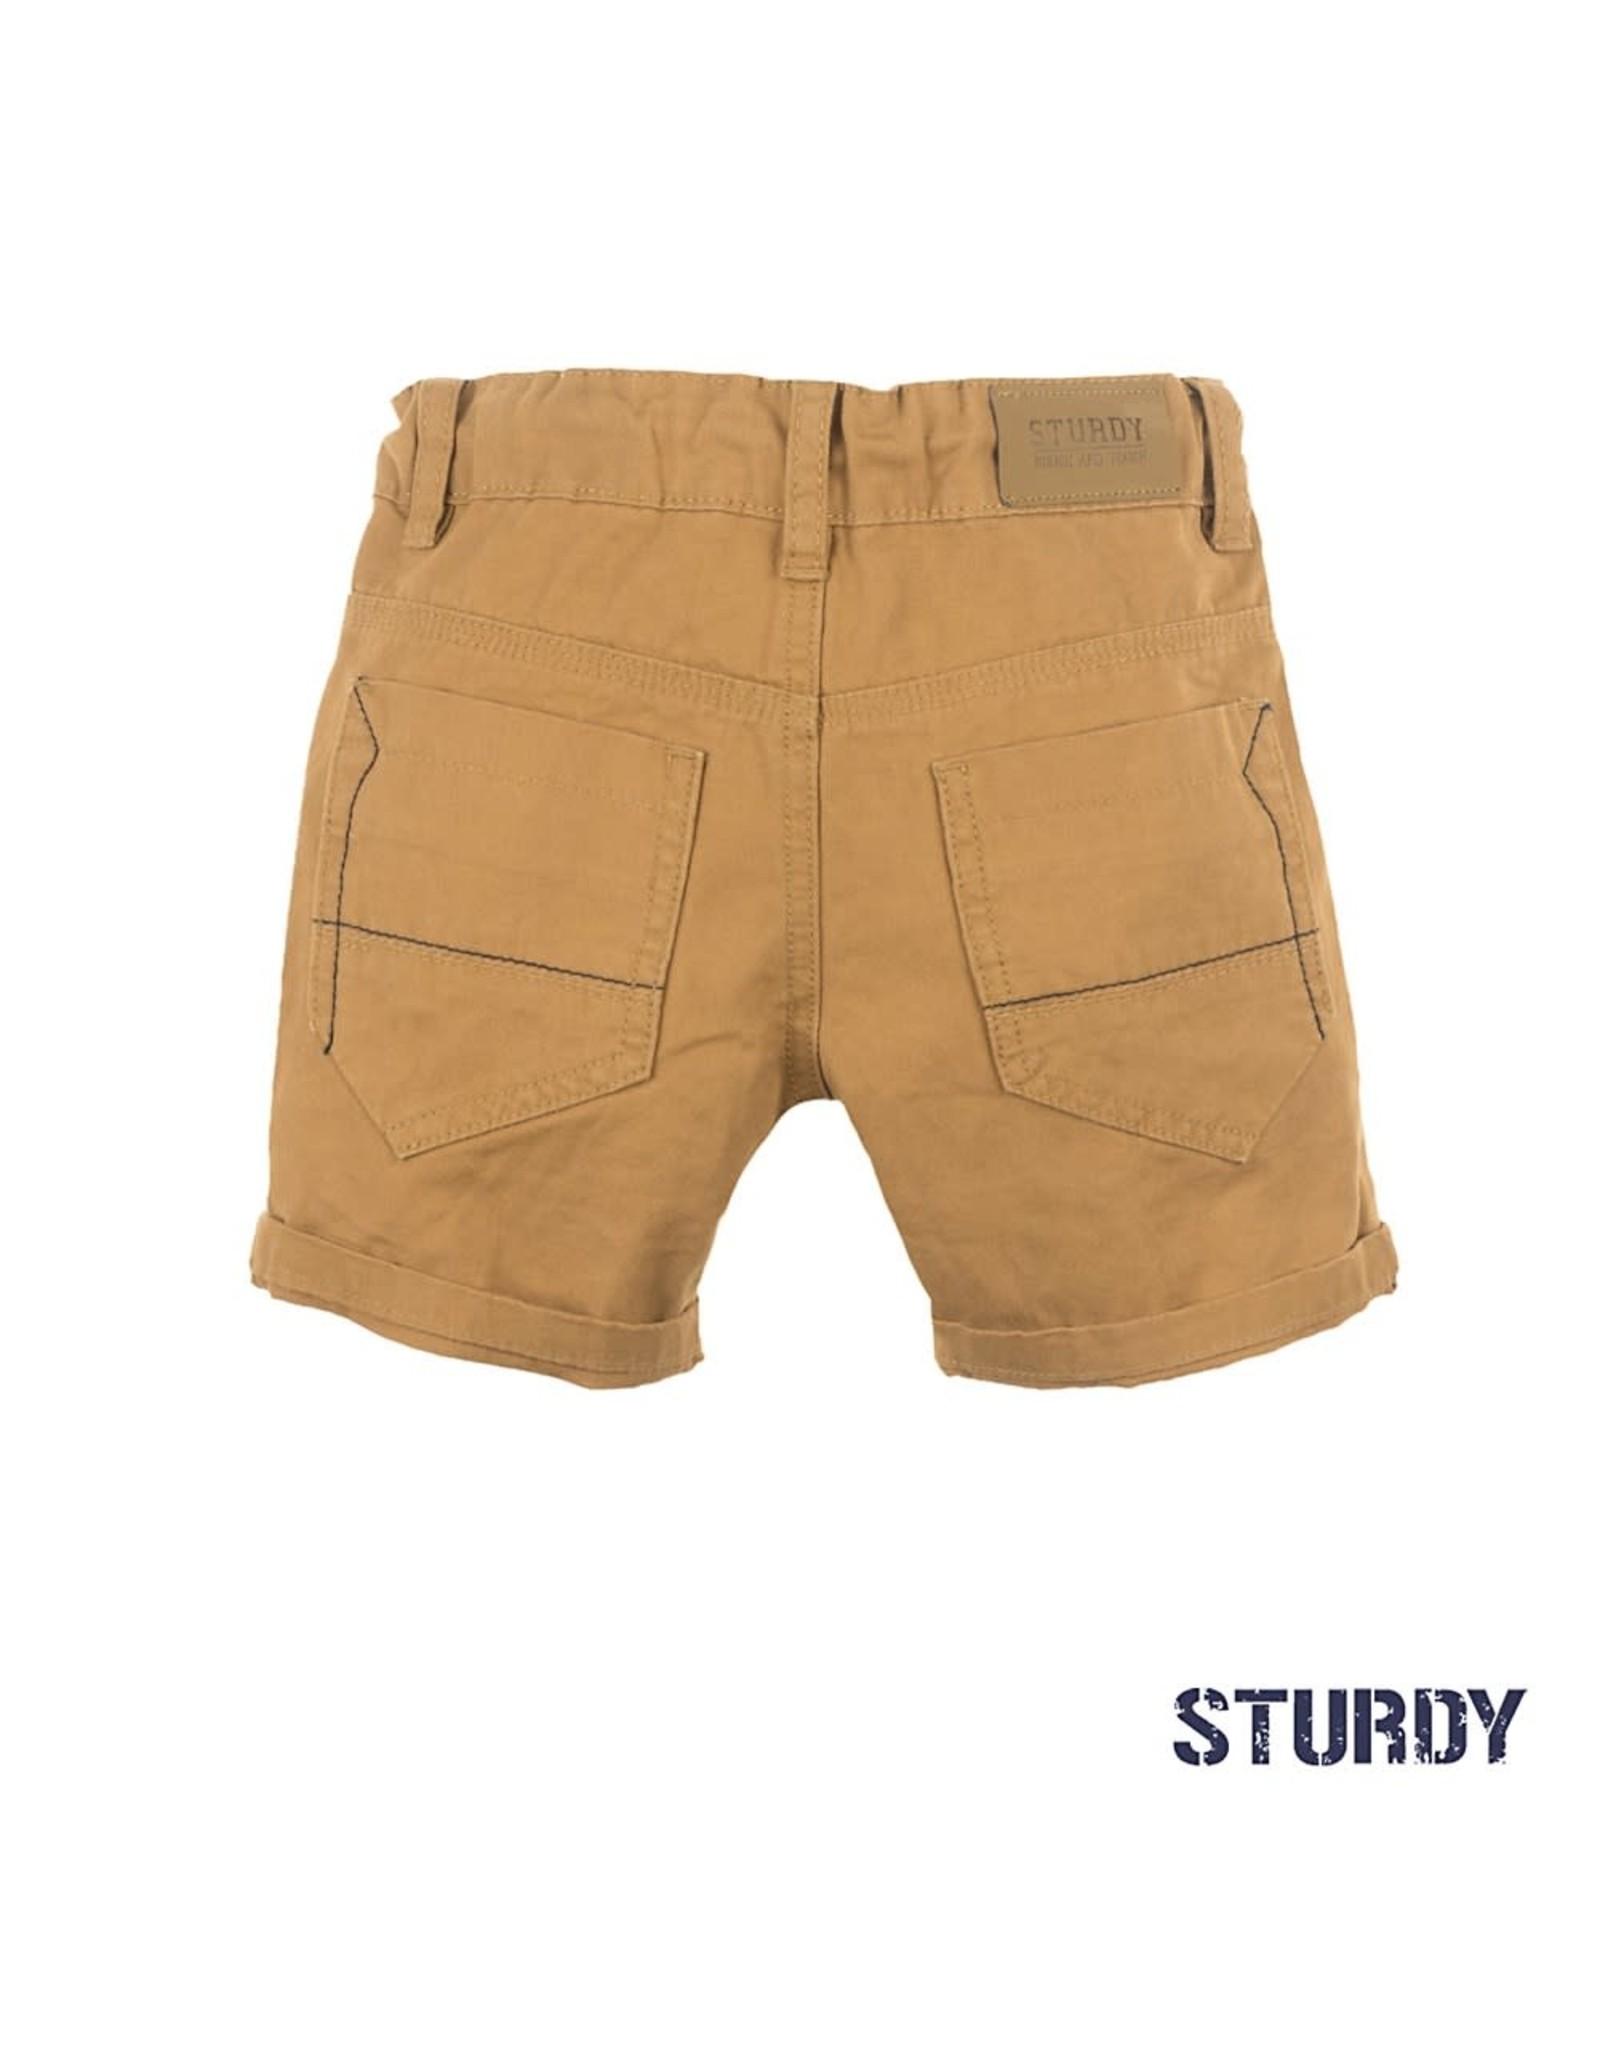 Sturdy Chino short - Summer Denims Camel